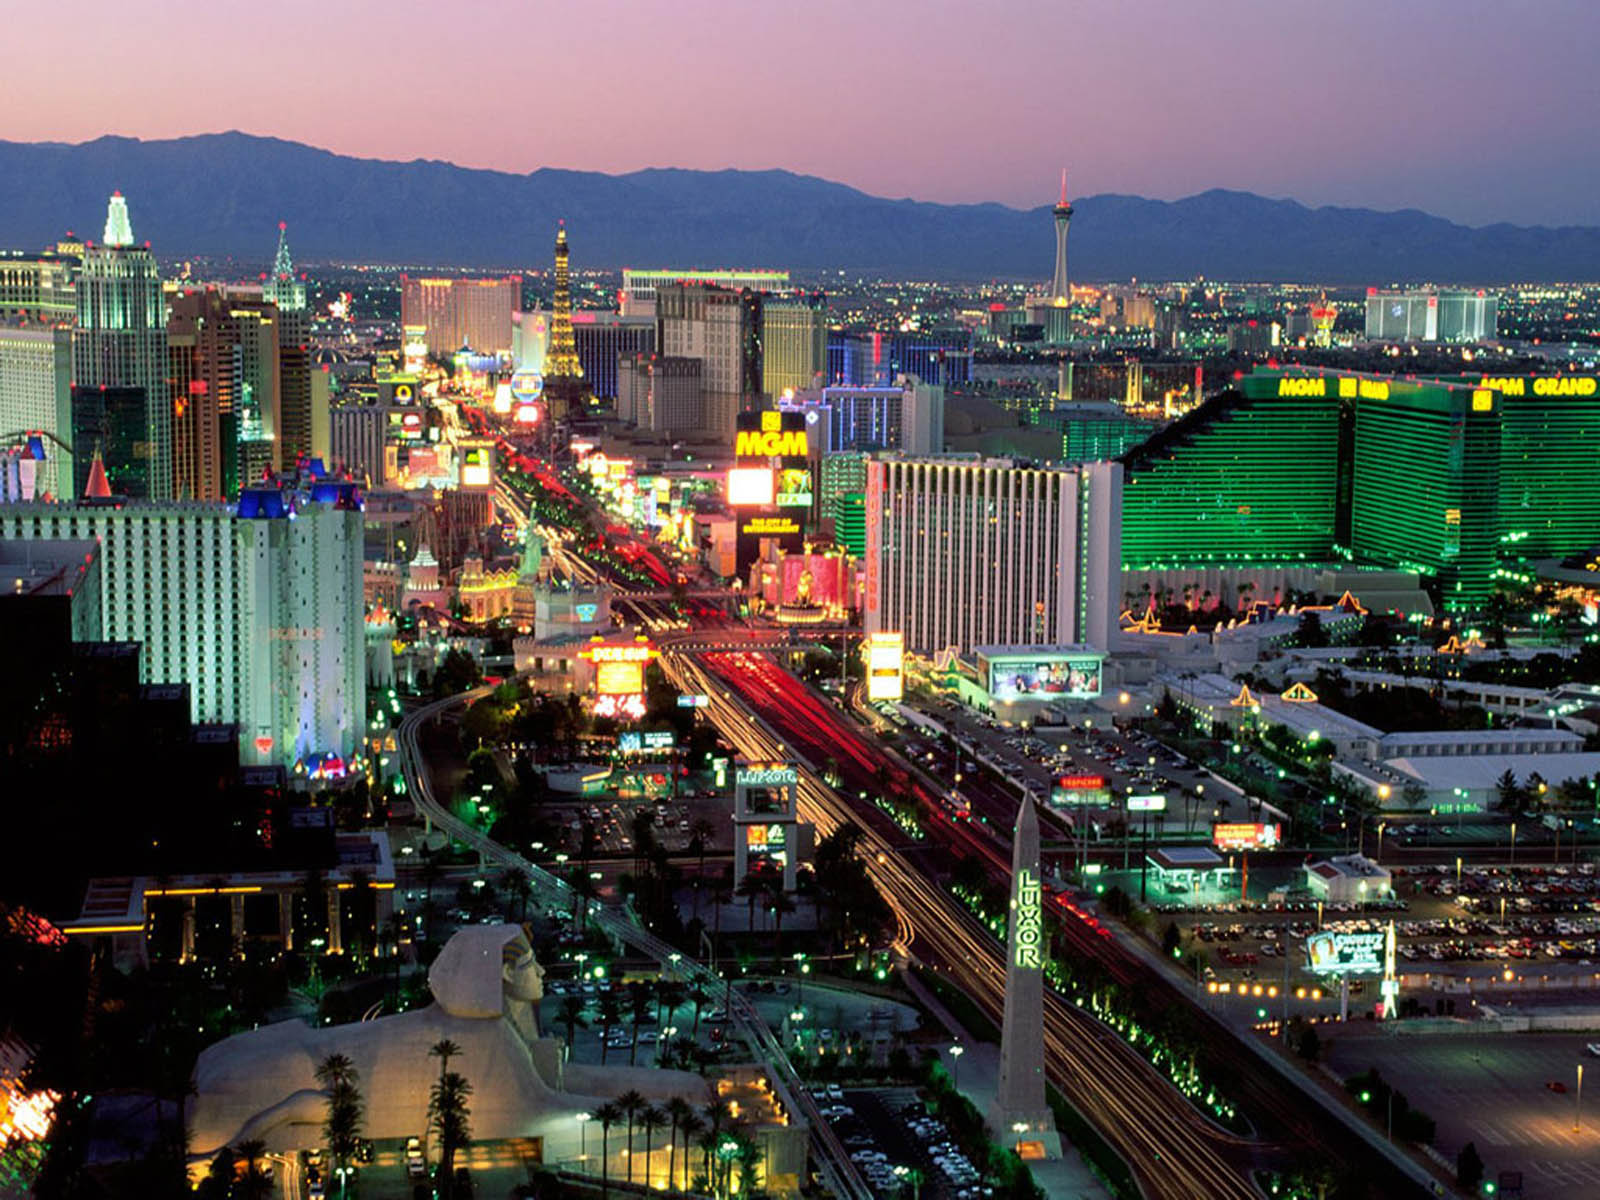 http://1.bp.blogspot.com/-_H7VBv_t8b0/T-kf6ut1L9I/AAAAAAAAEns/q8915QO-y3w/s1600/Las+Vegas+Nevada+1.jpg